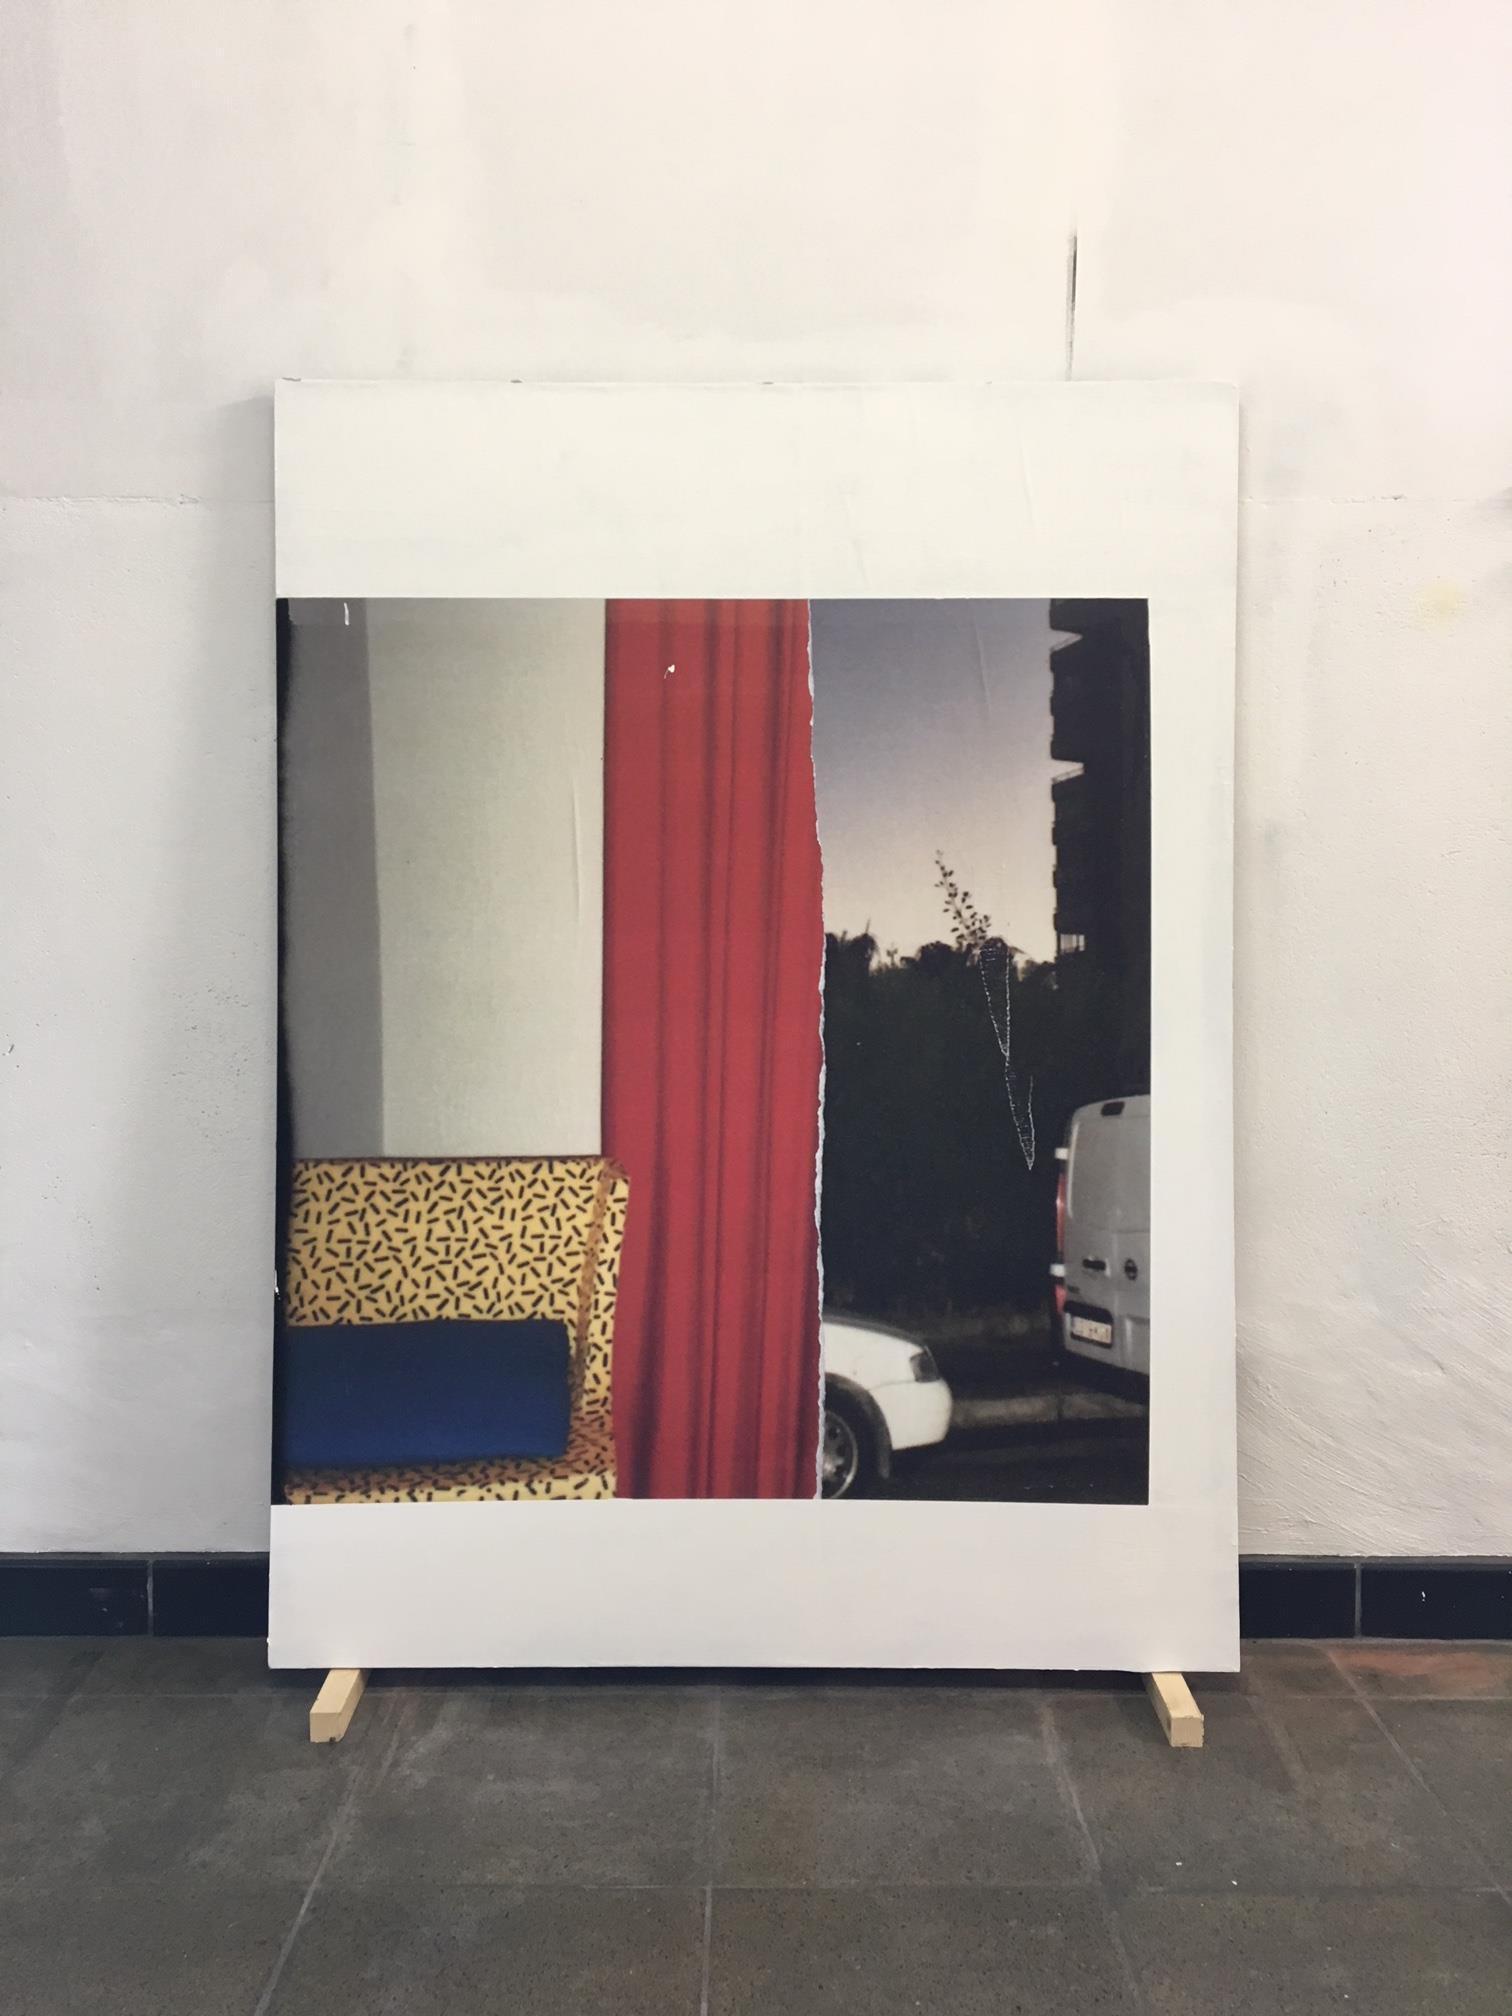 Fragment #11 - Memphis wheels Milano (IT), Benidorm (ES) 120 x 90 cm Magistra blueback 120 gr., acrylics, wall paste on hard board. 2018 | © MAX KESTELOOT